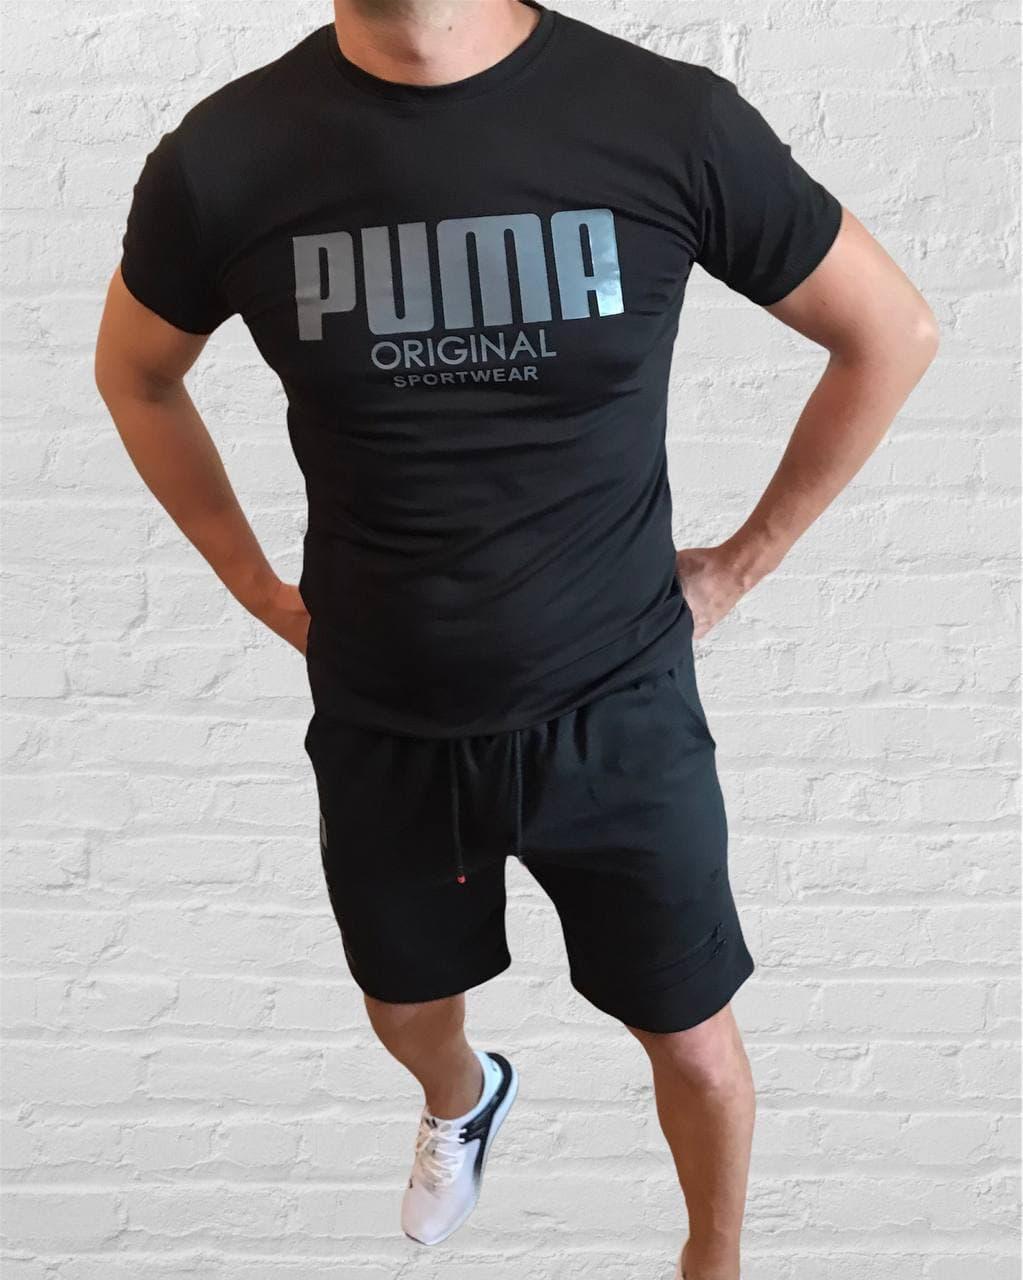 Мужской спортивный костюм (футболка и шорты) Puma Talkative